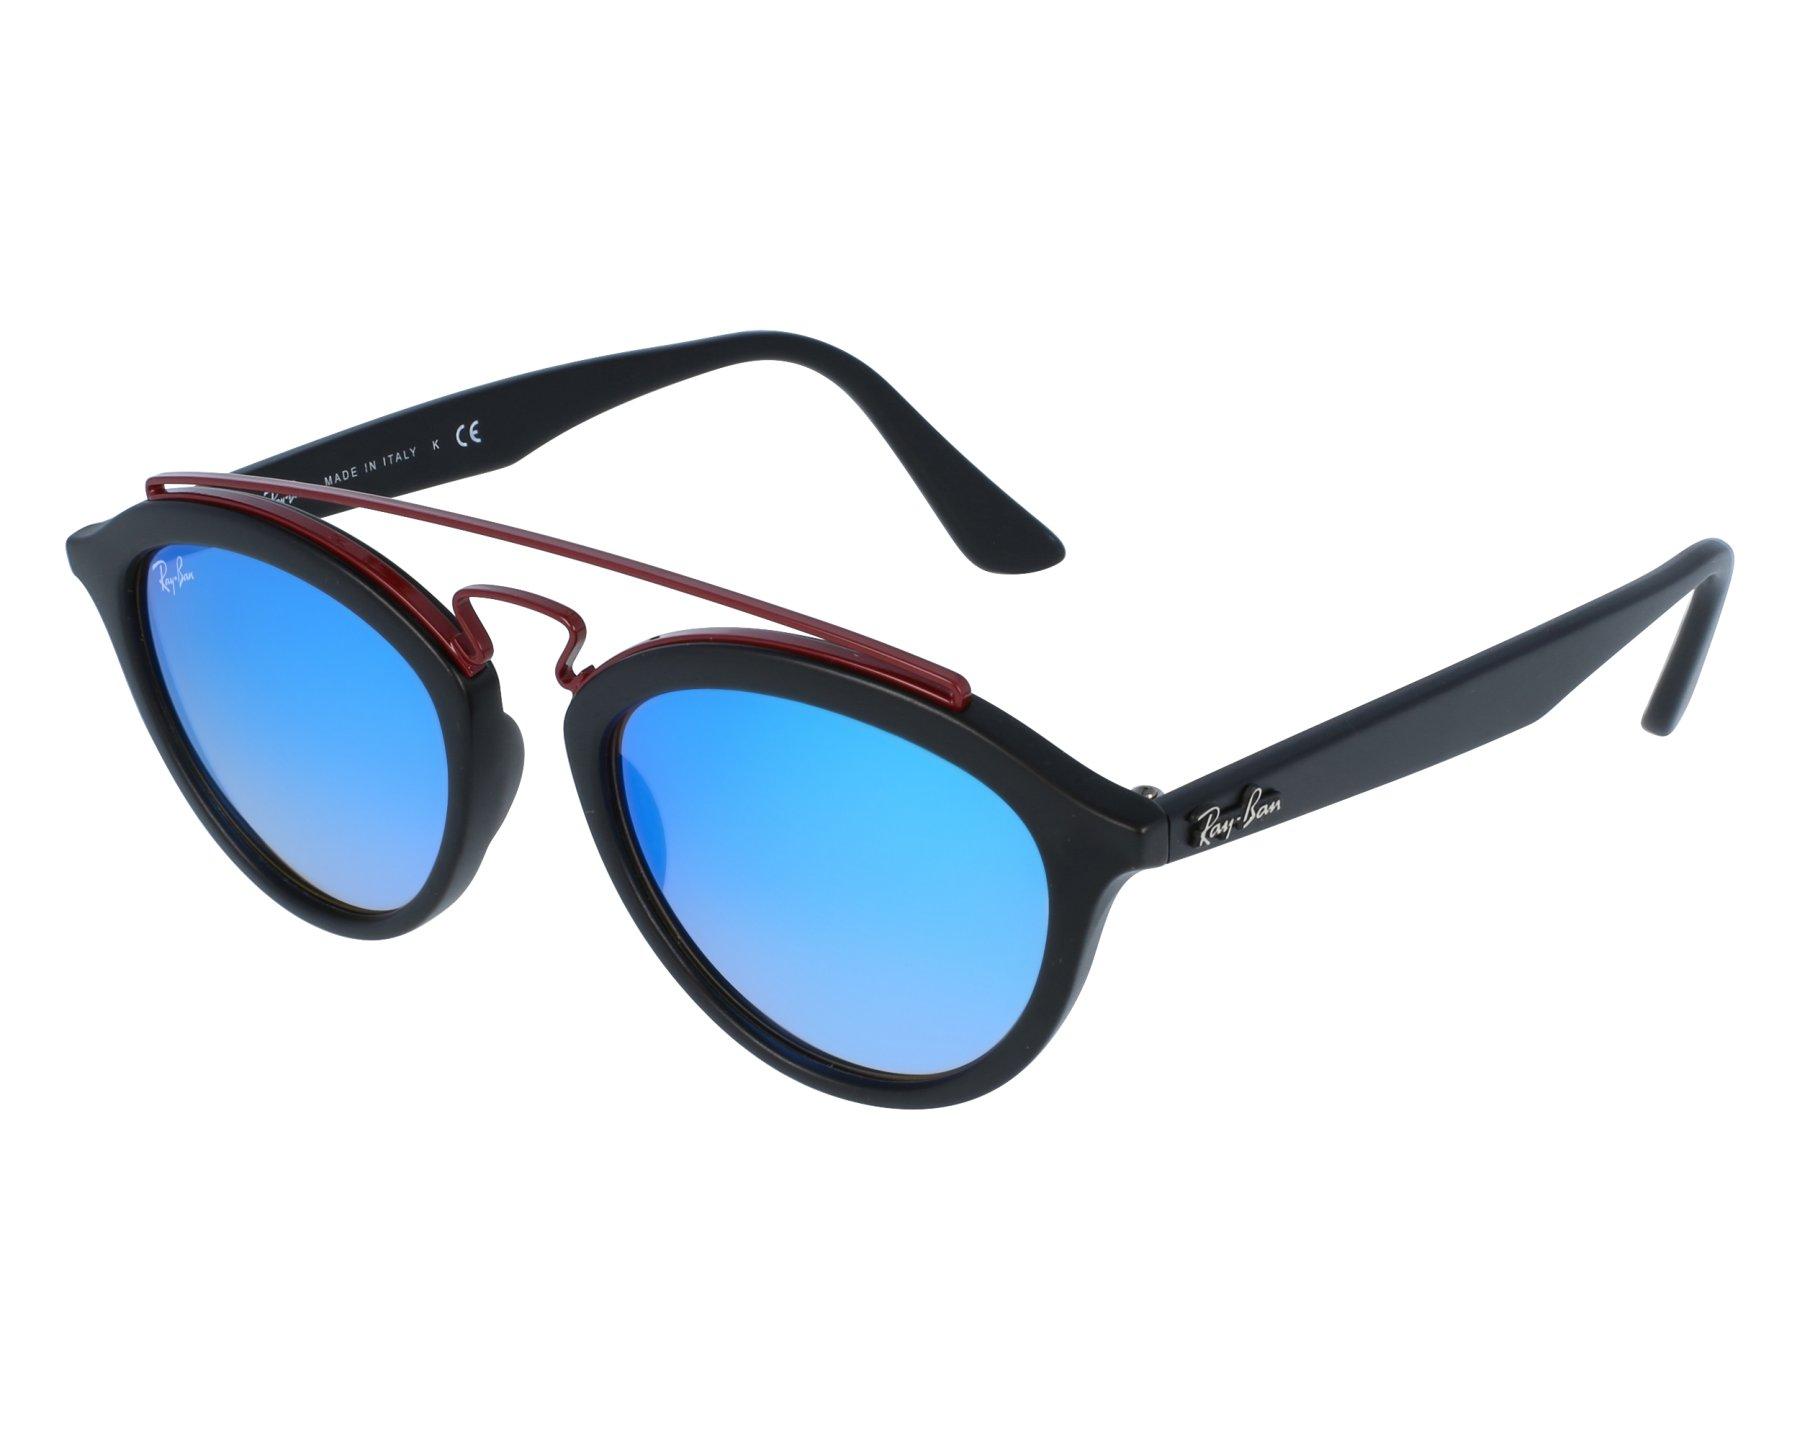 0d9706661b Sunglasses Ray-Ban RB-4257 6252 B7 50-19 Black Bordeaux front